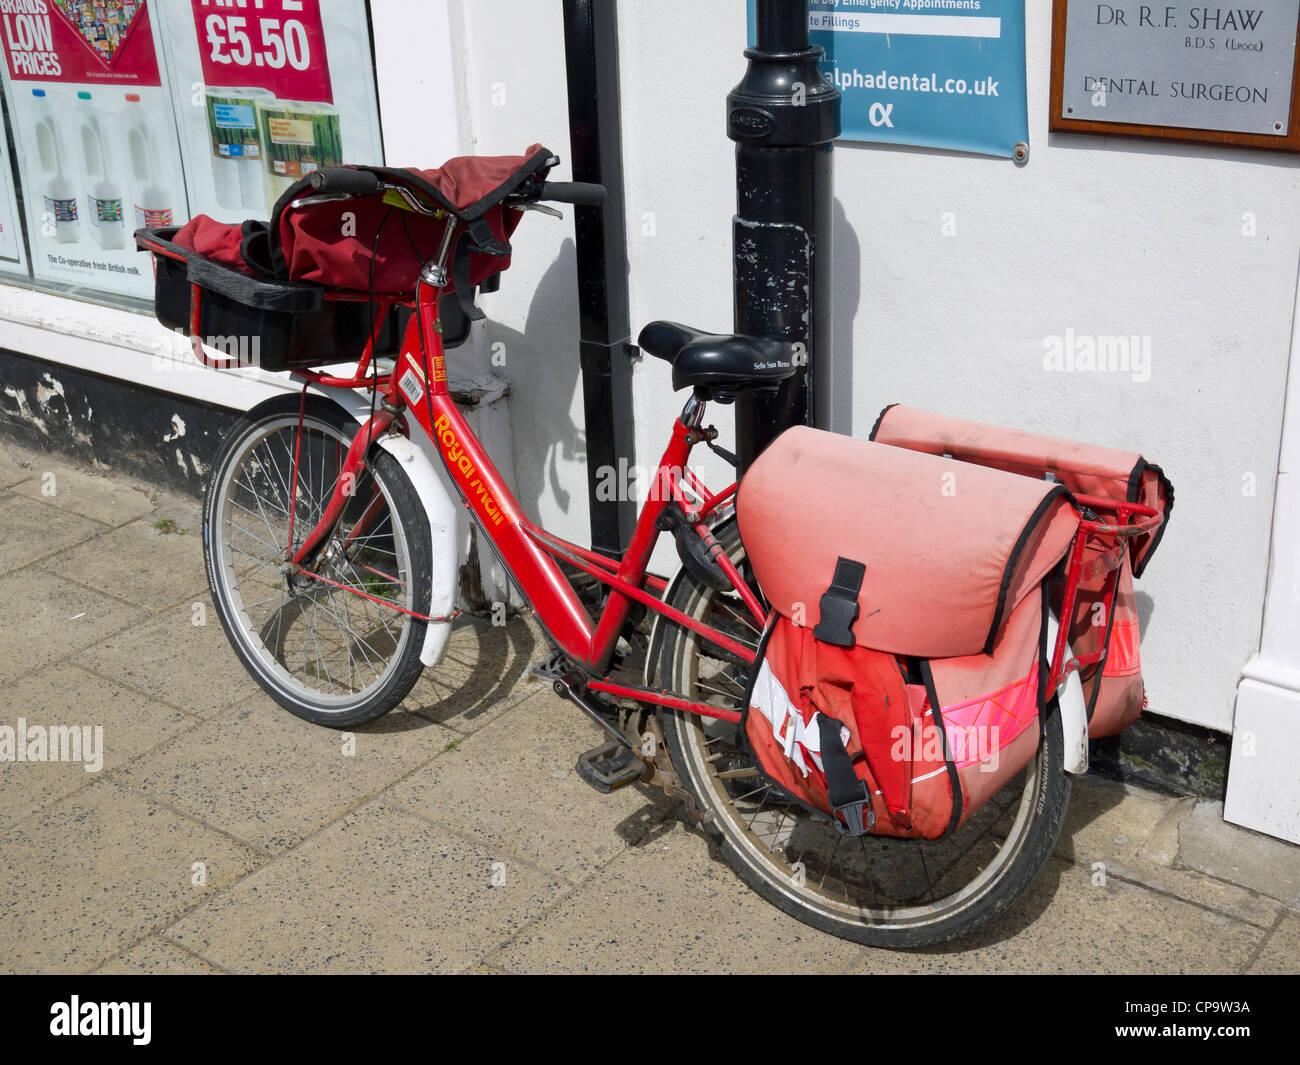 Postman Bicycle Stock Photos & Postman Bicycle Stock ...